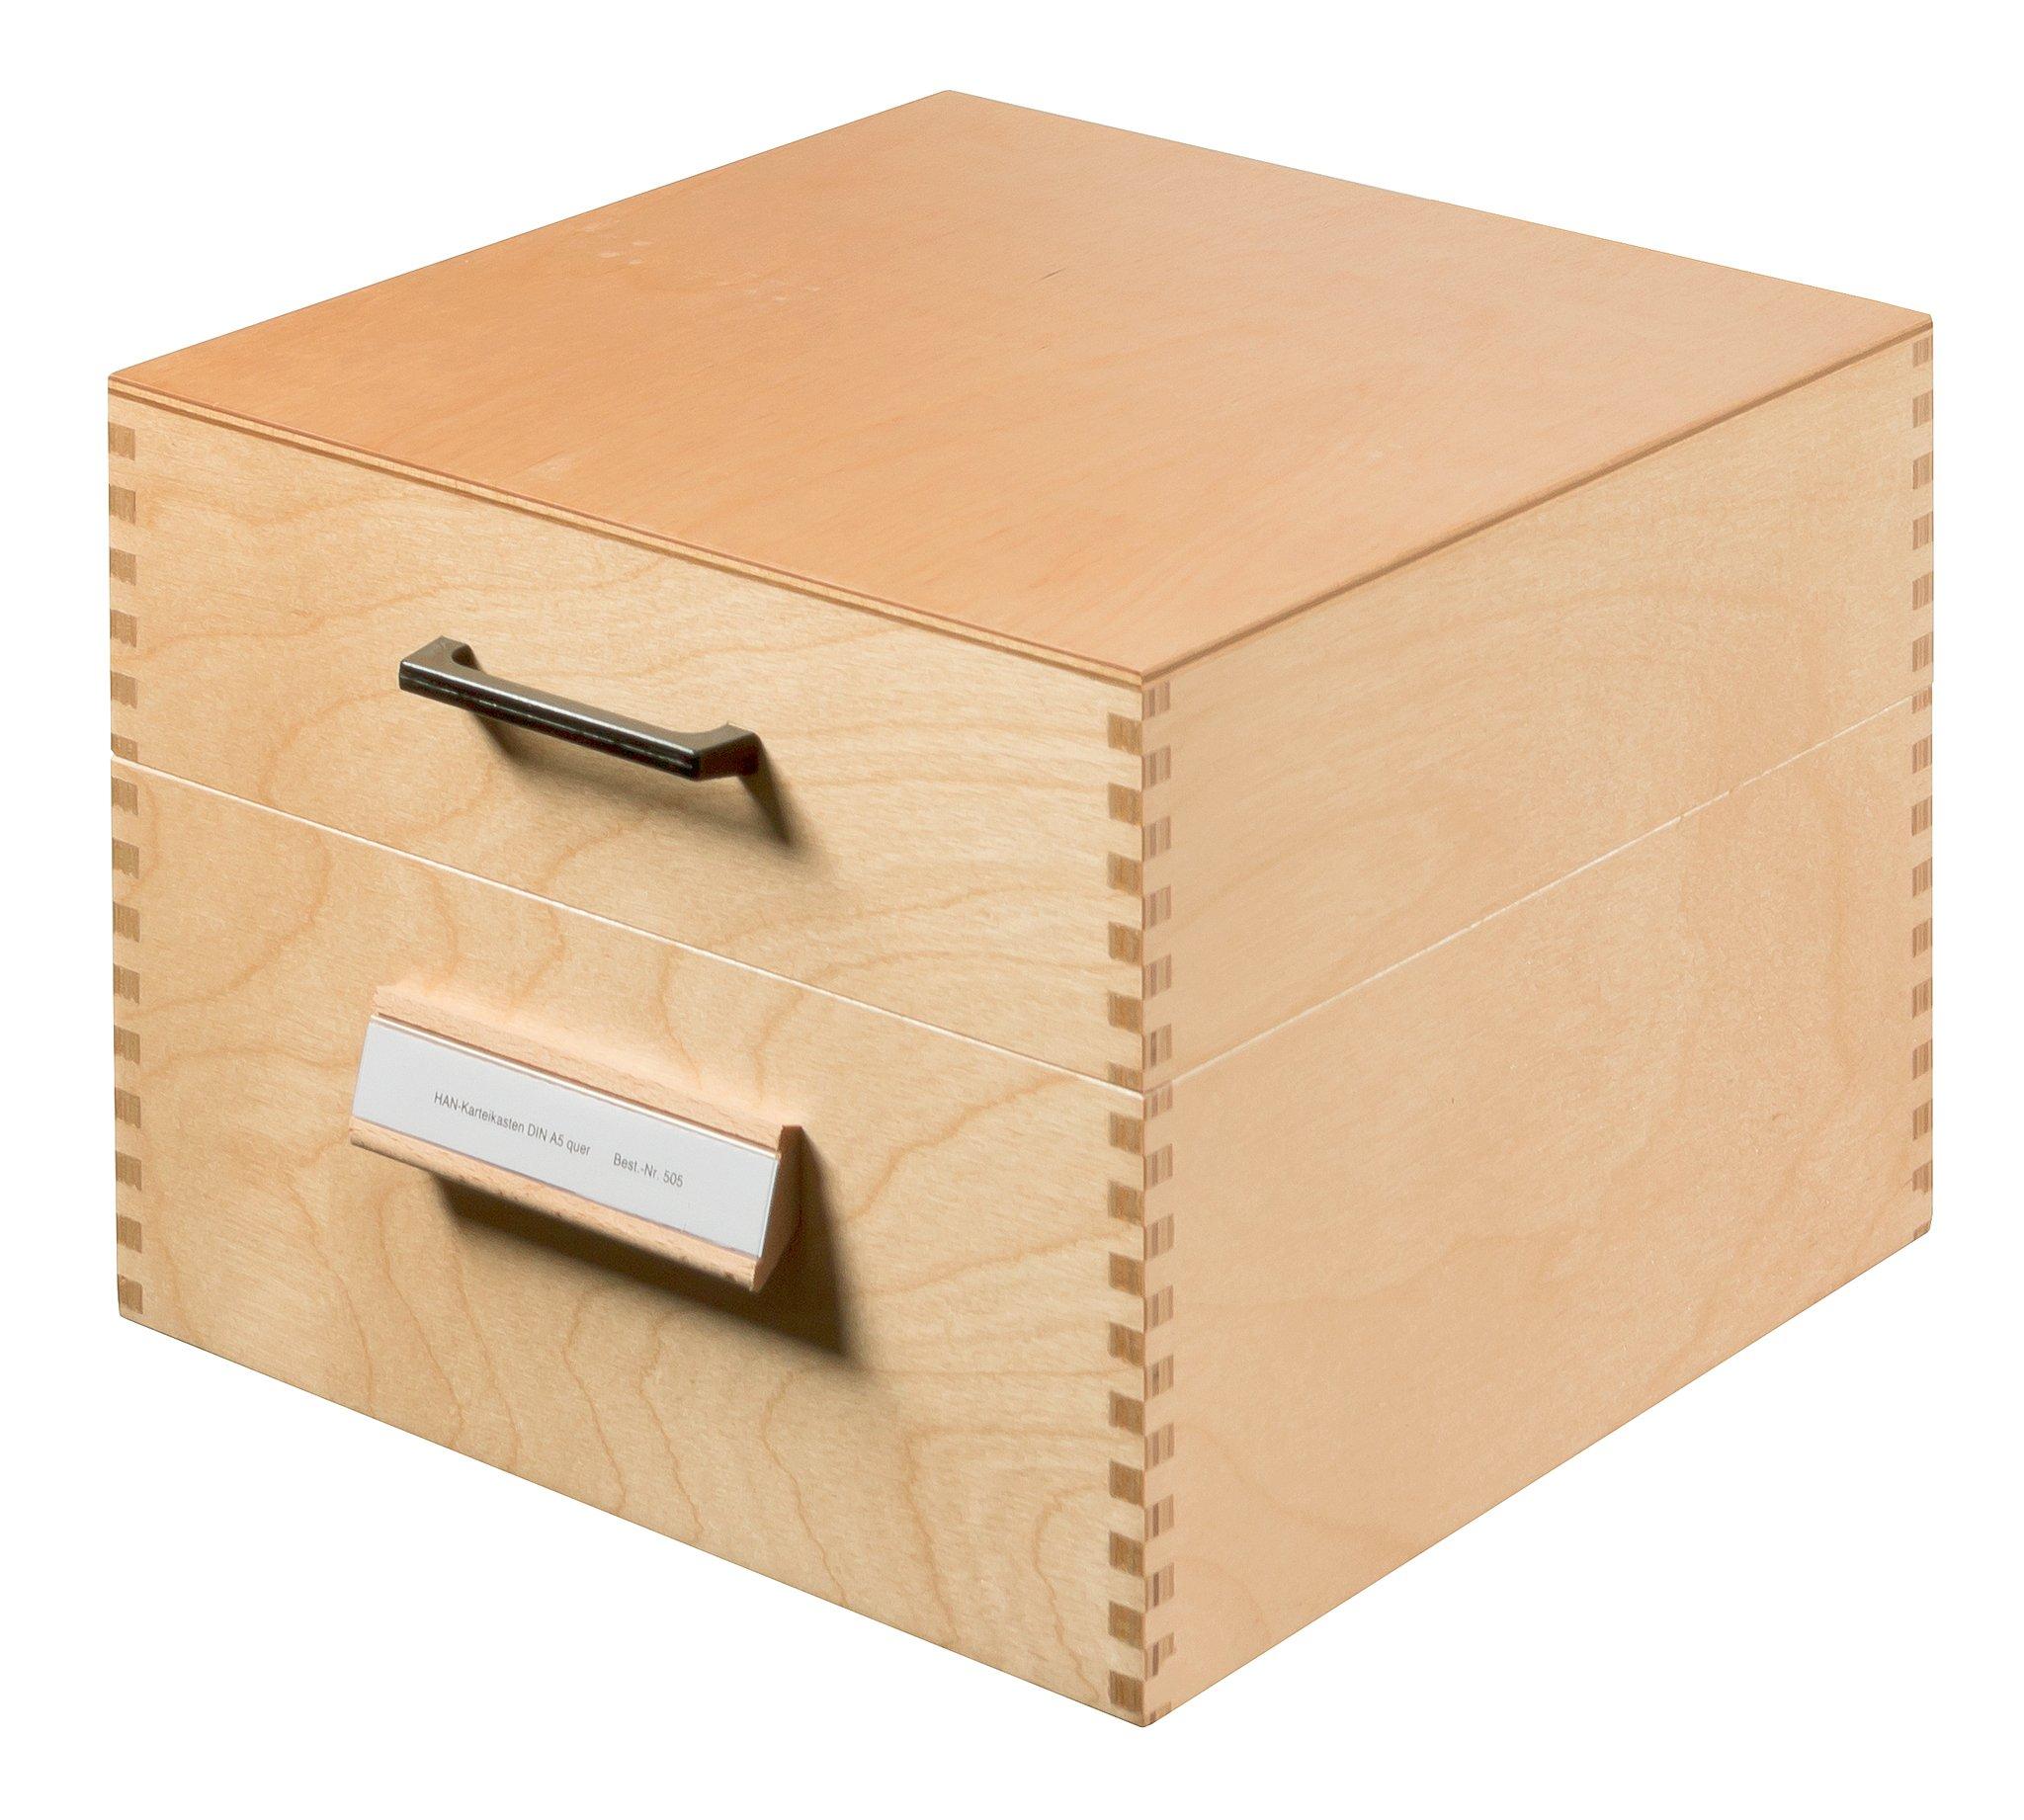 Han 505 Card Index Box A5 Wooden 255 x 250 x 190 mm Natural Colour